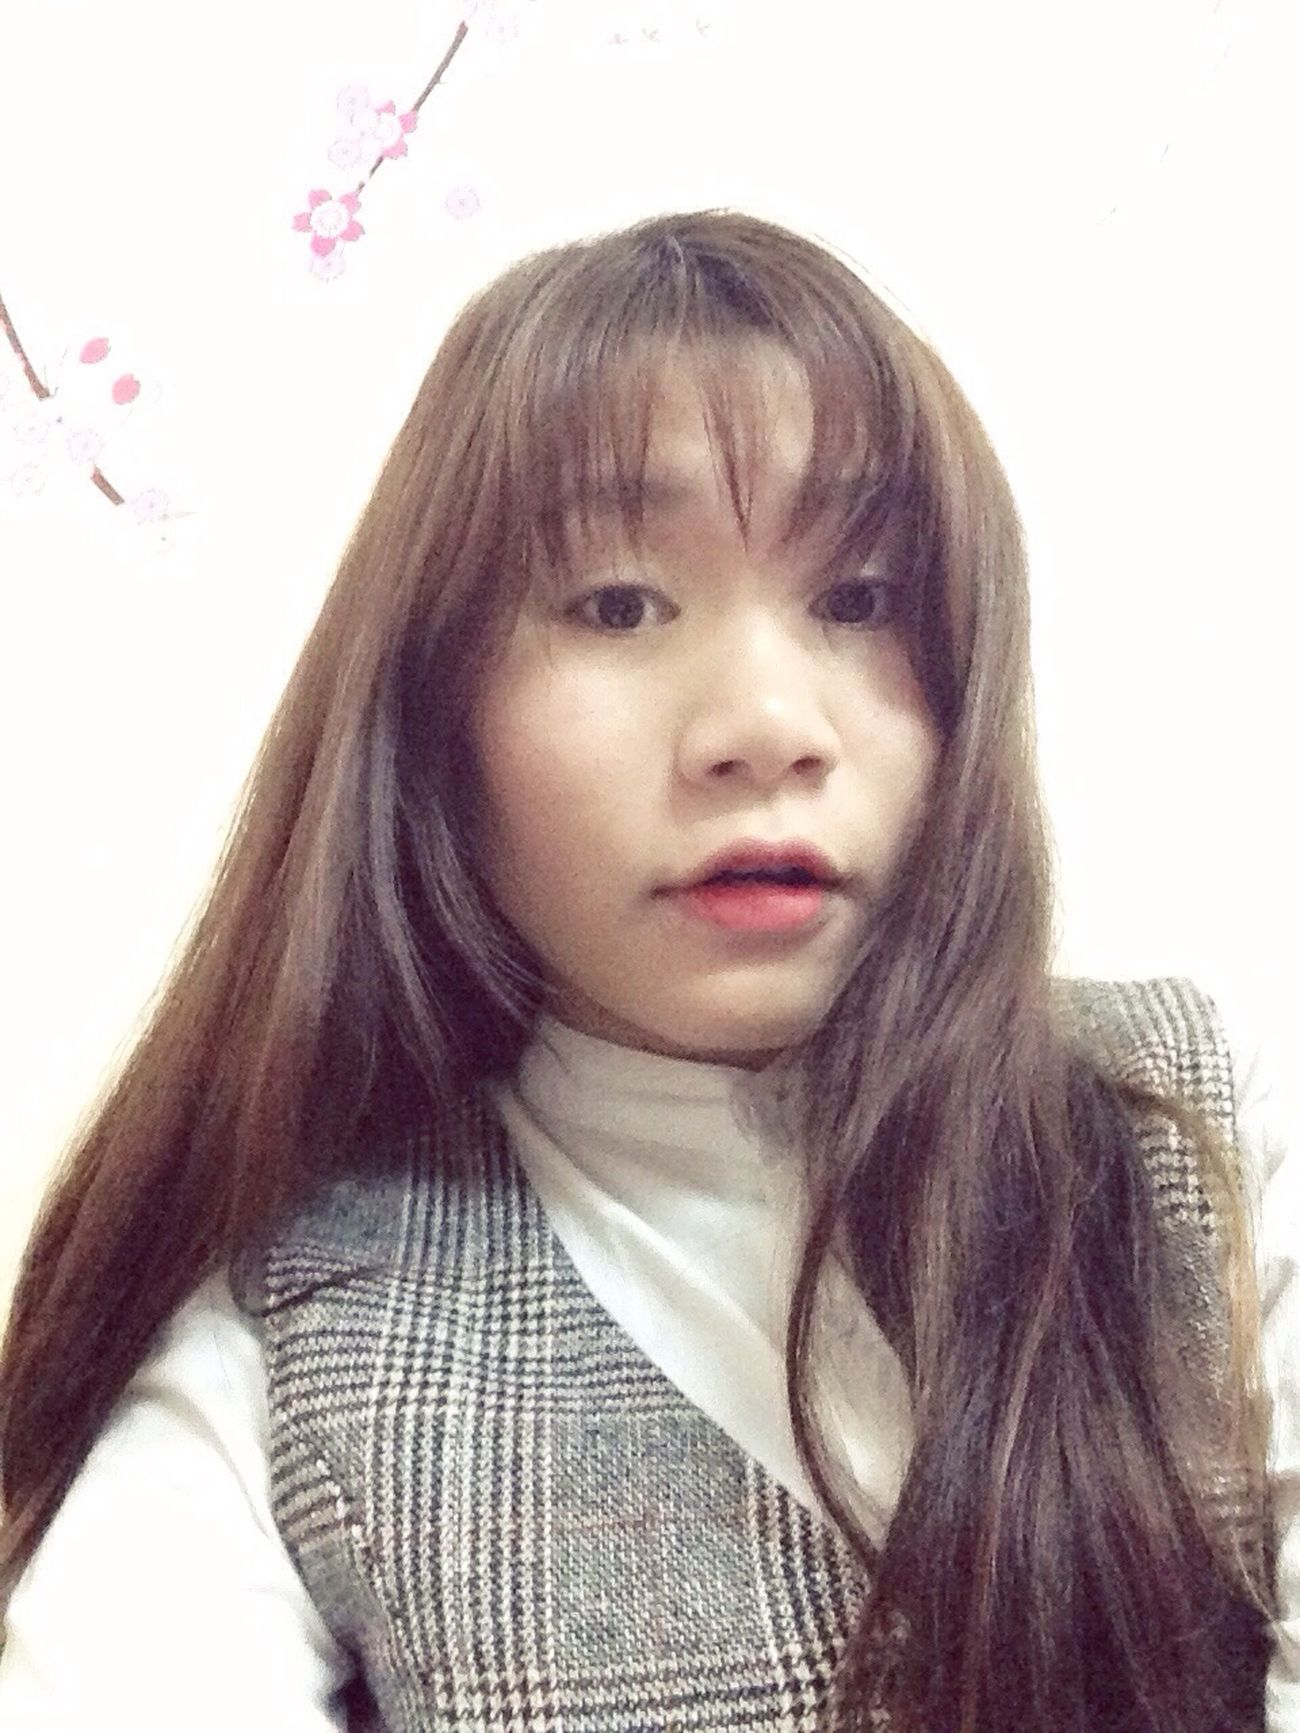 Selfie ✌ First Eyeem Photo